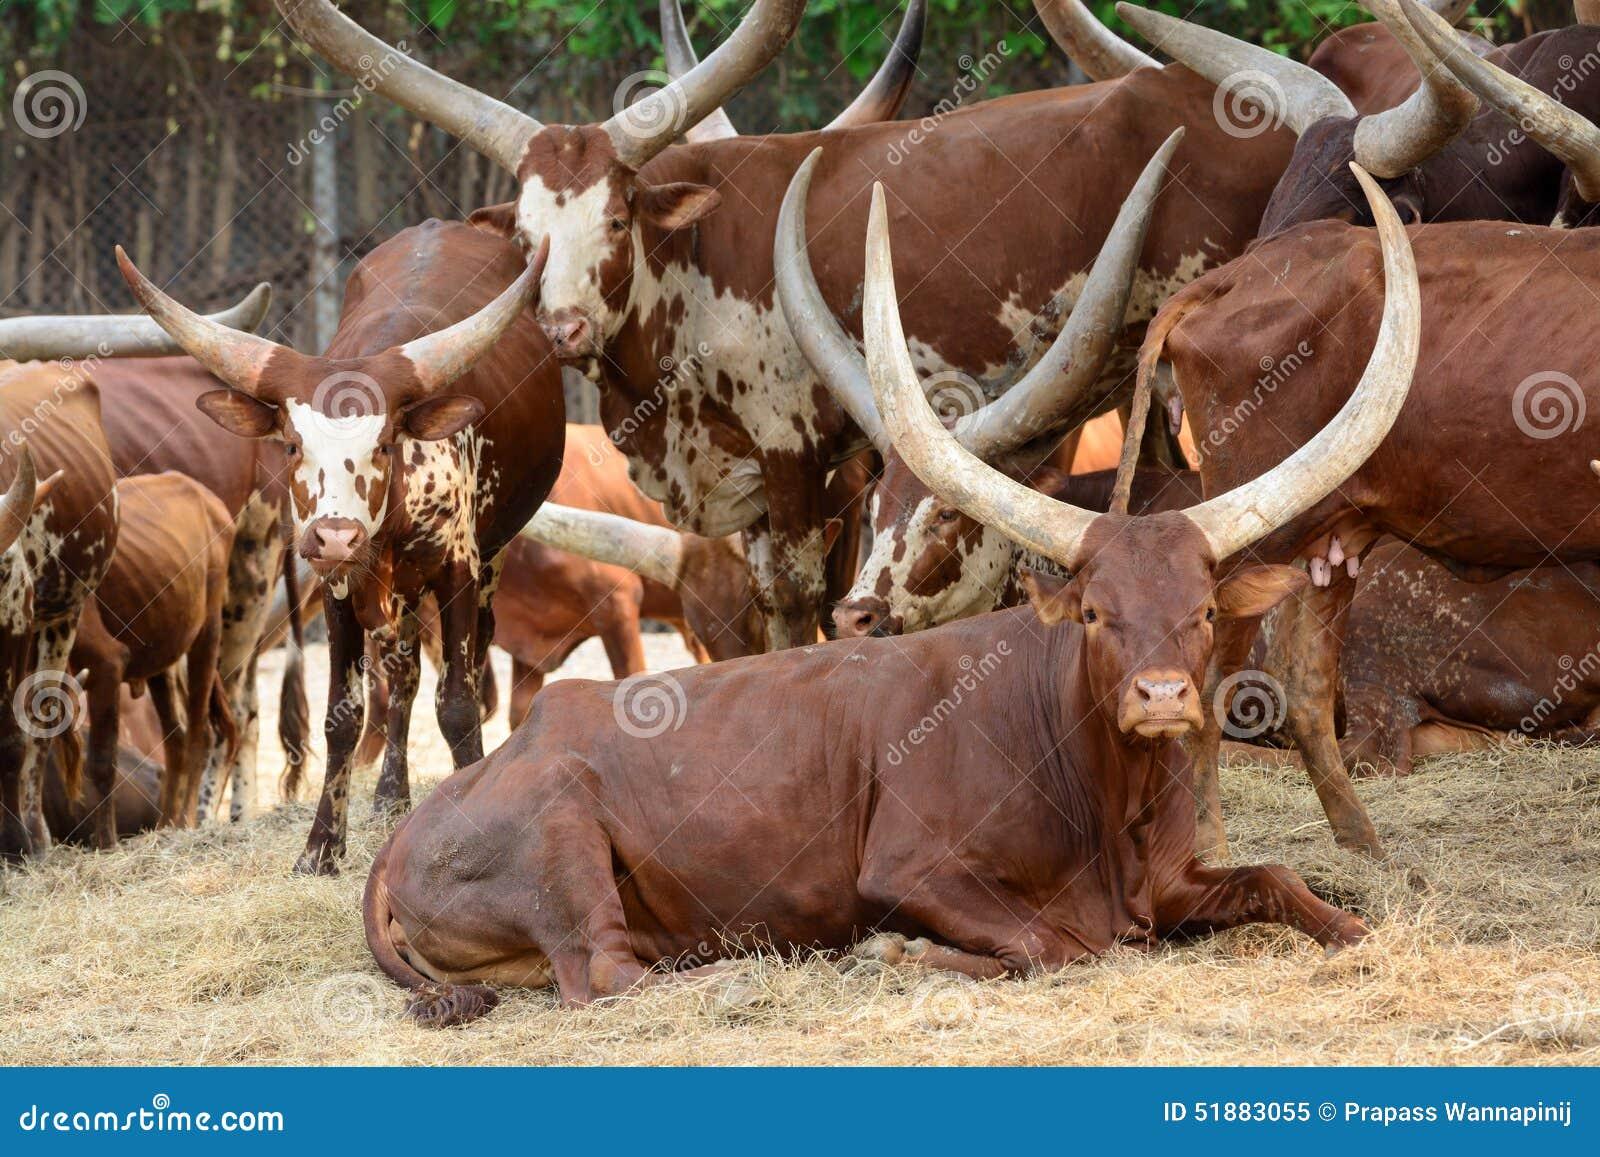 strong bull cartoon vector 51270949. Black Bedroom Furniture Sets. Home Design Ideas